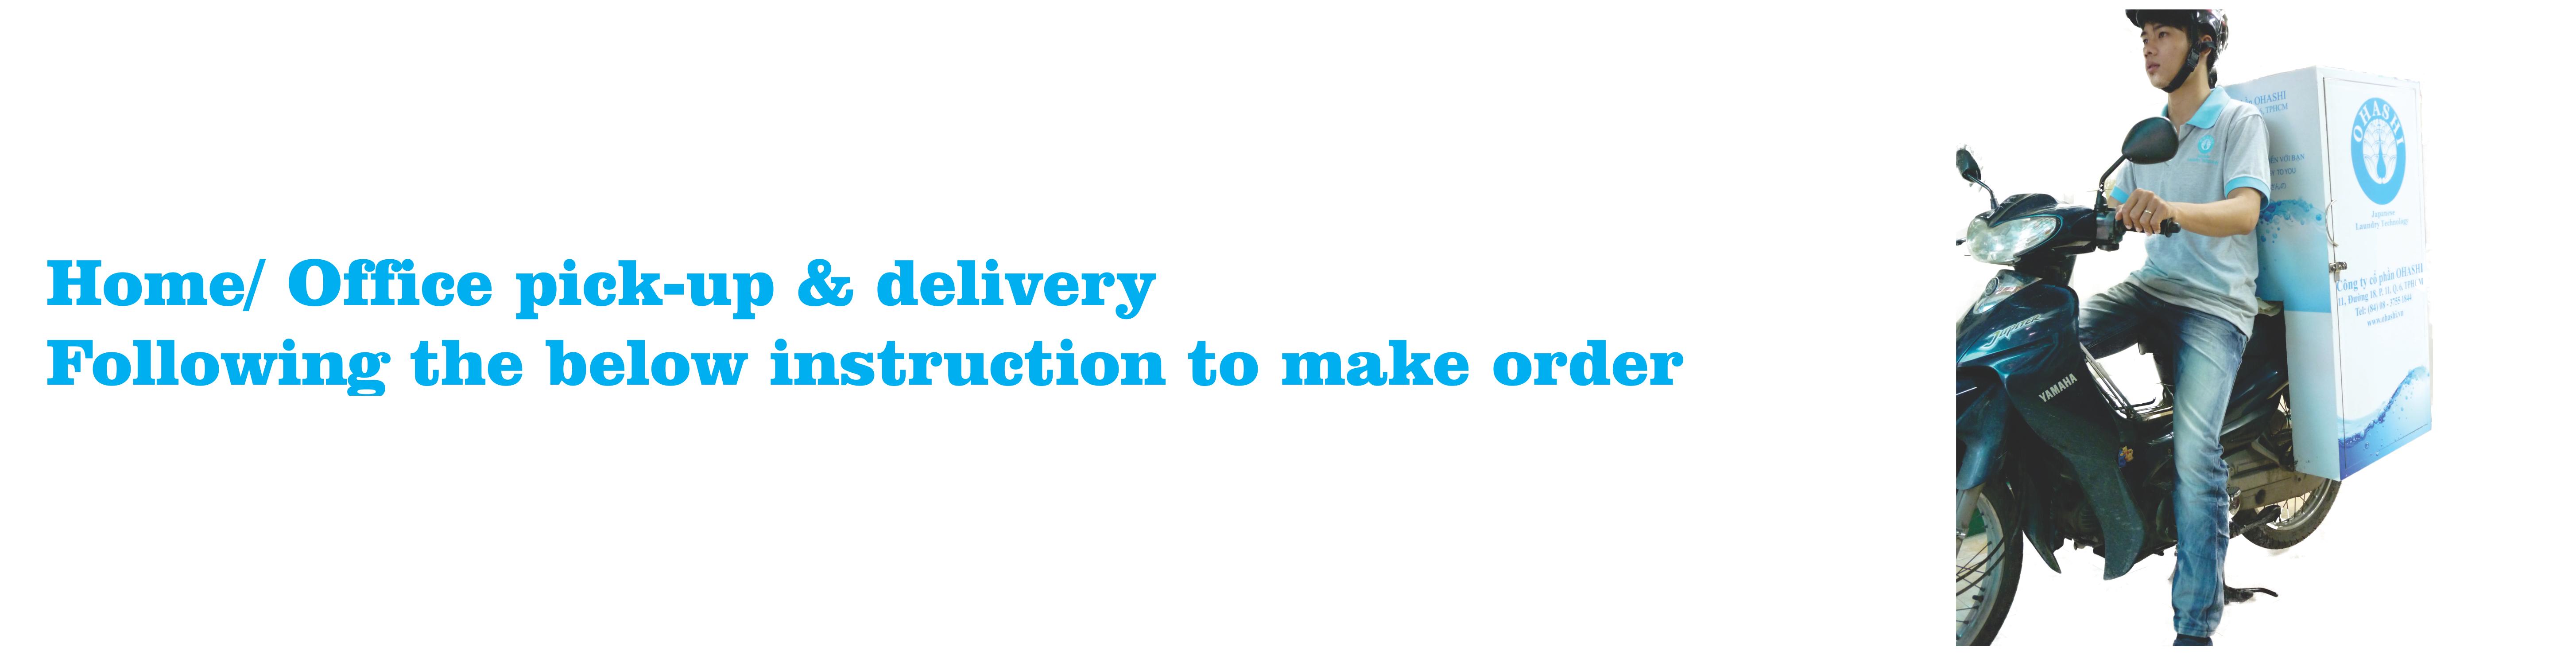 Hinh deliver